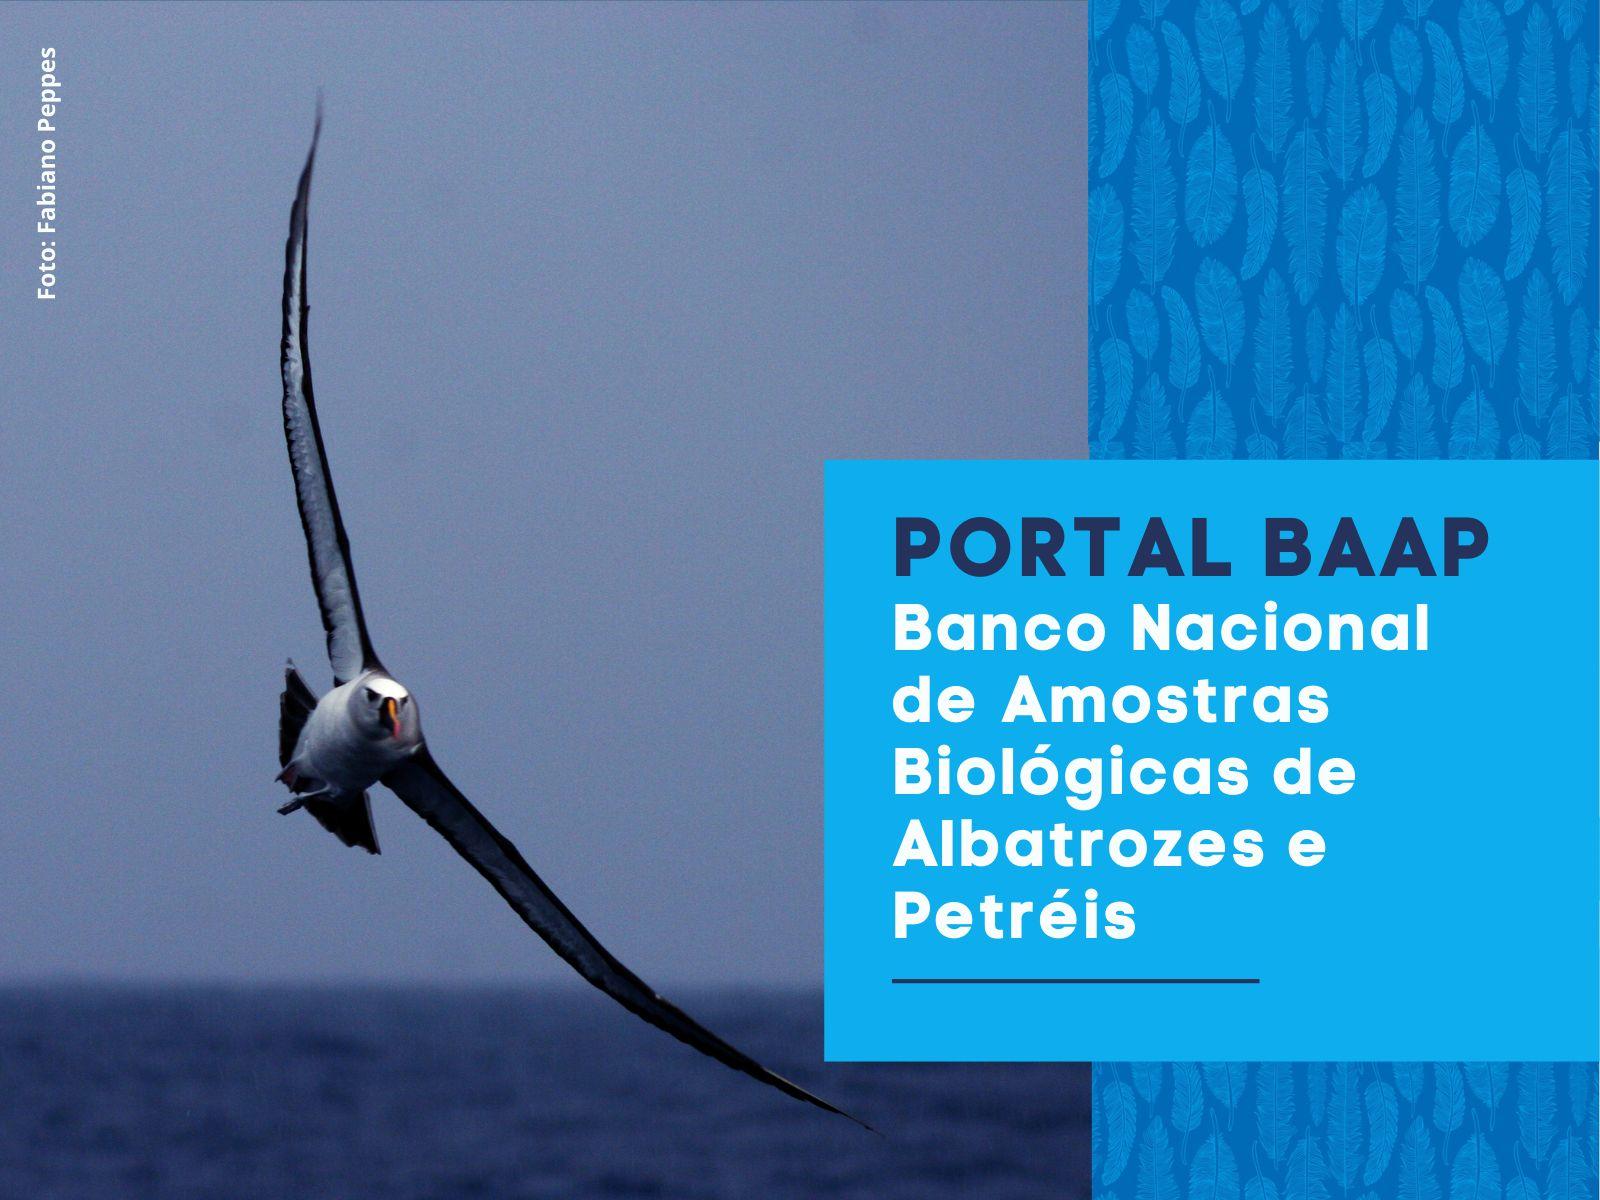 Cópia de PORTAL BAAP Banco Nacional de Amostras Biológicas de Albatrozes e Petréis (2)